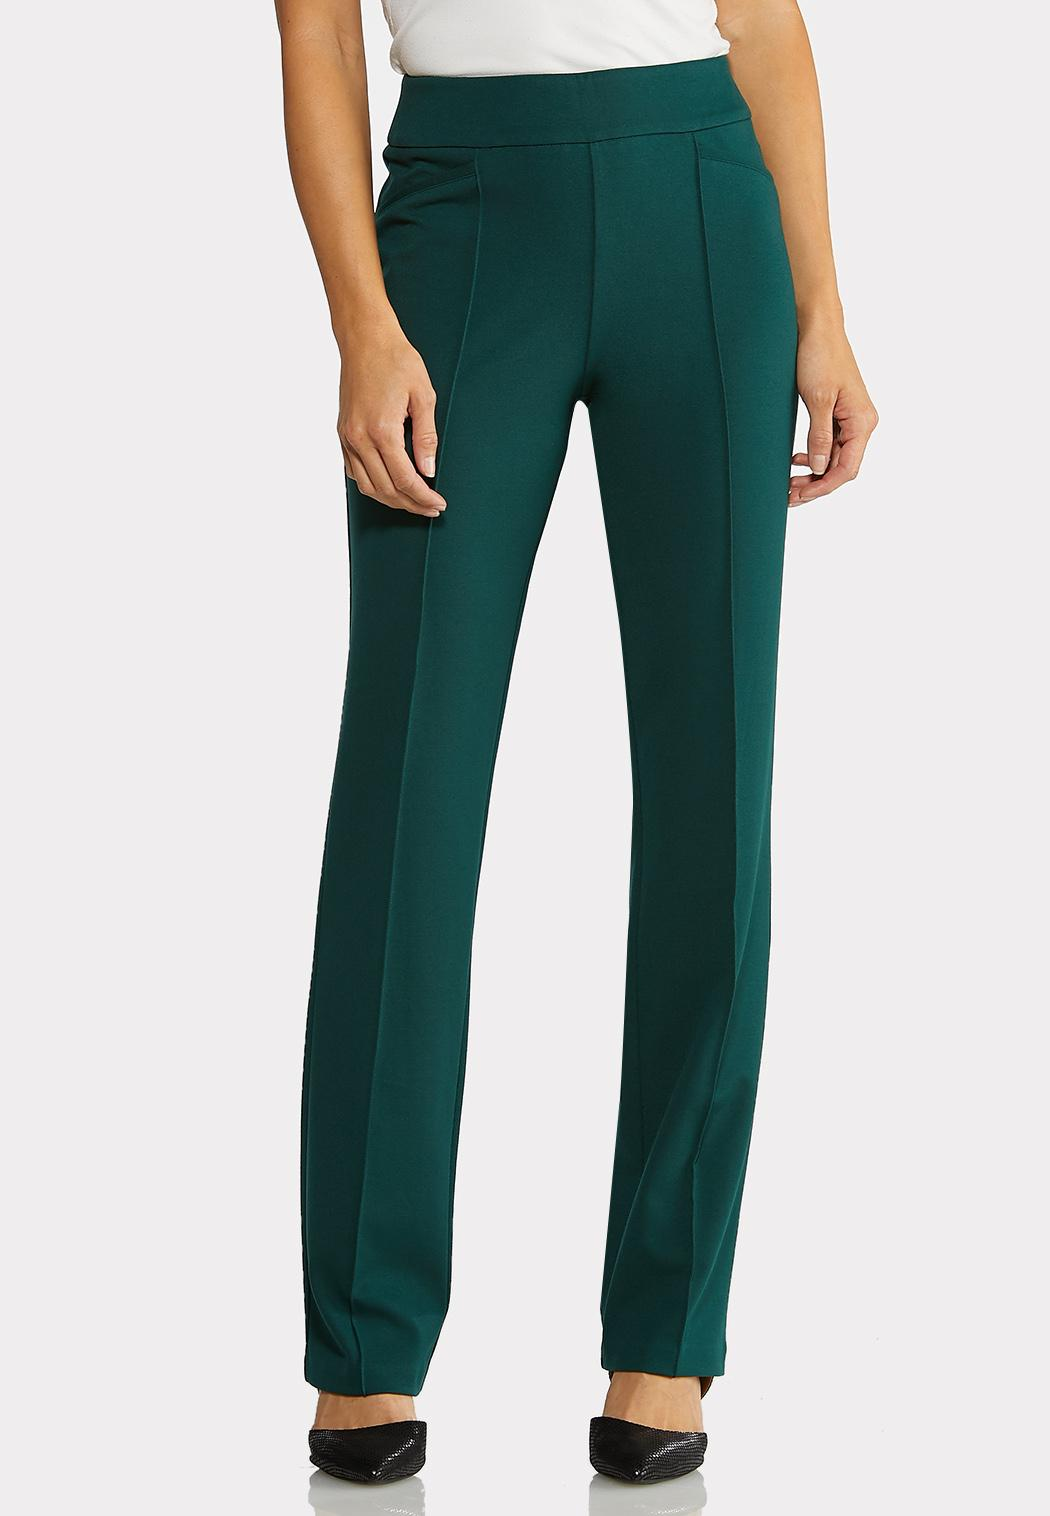 Petite Pintuck Straight Leg Ponte Pants